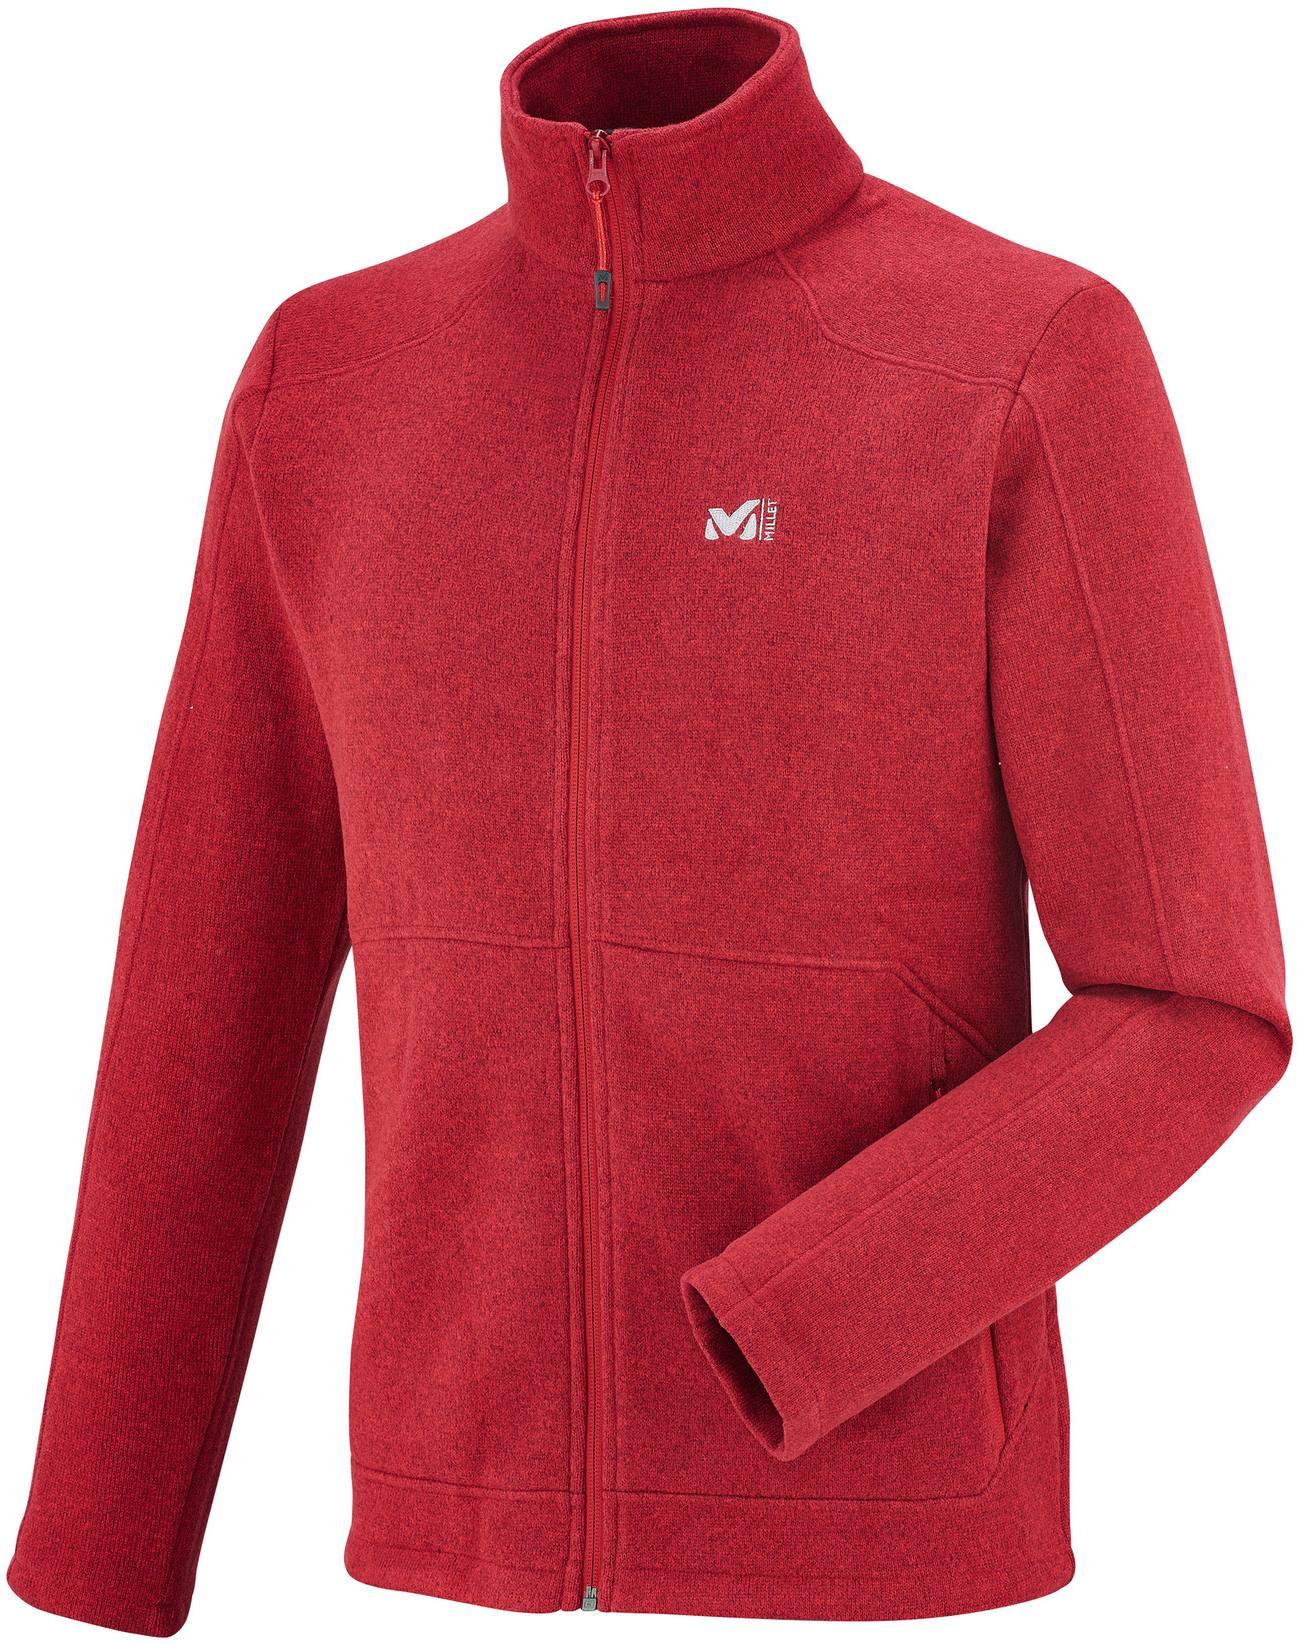 online store 9d827 a481e Millet Hickory Fleece Jacket